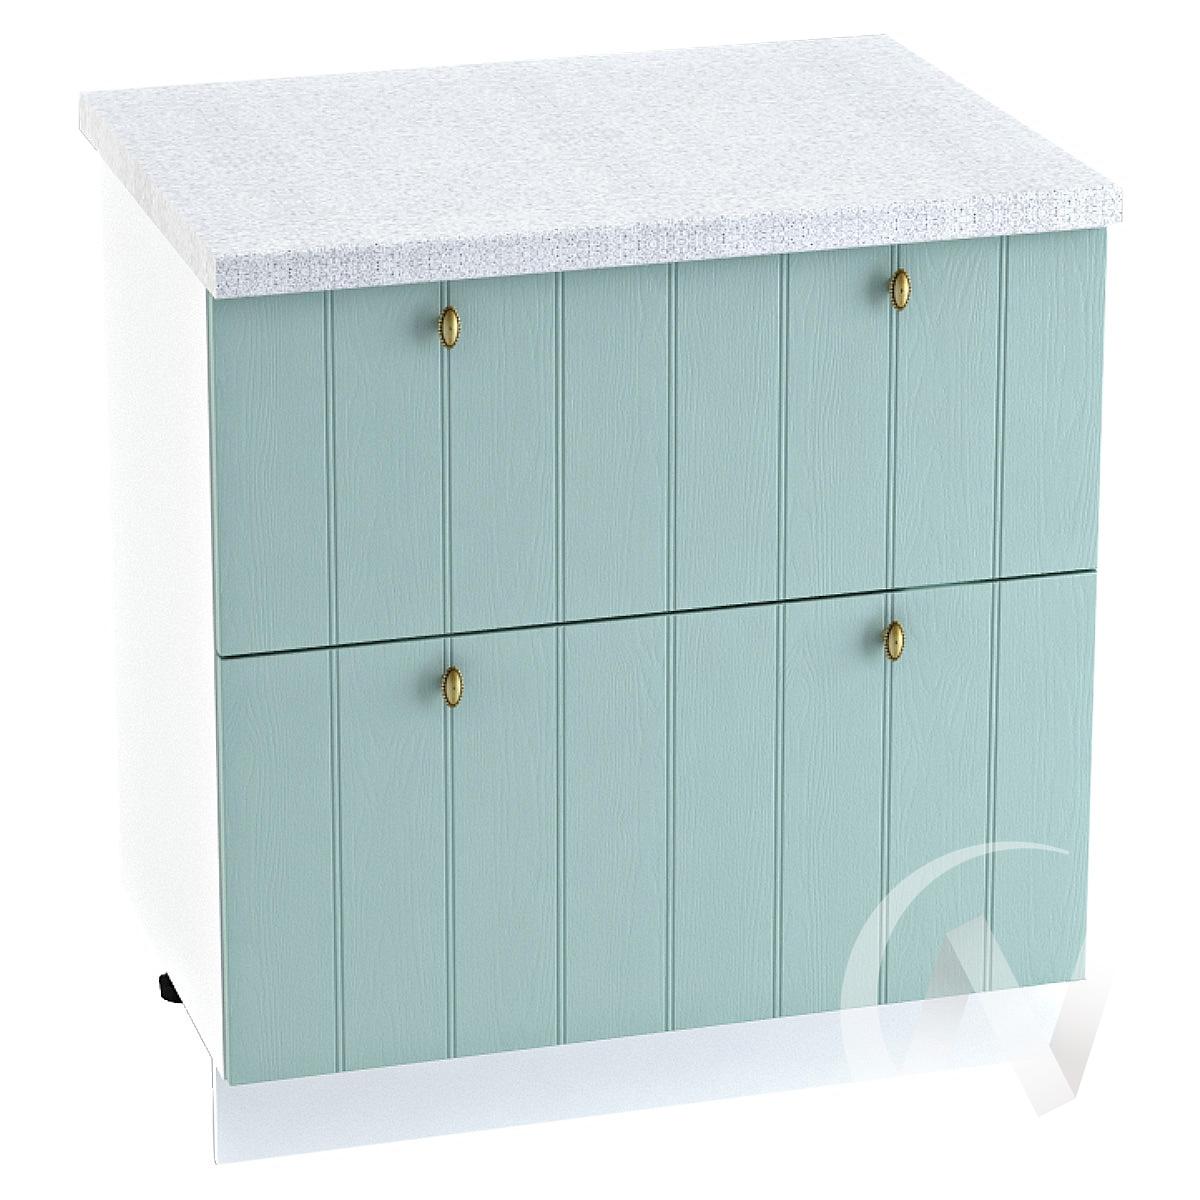 "Кухня ""Прованс"": Шкаф нижний с 2-мя ящиками 800, ШН2Я 800 (голубой/корпус белый)"